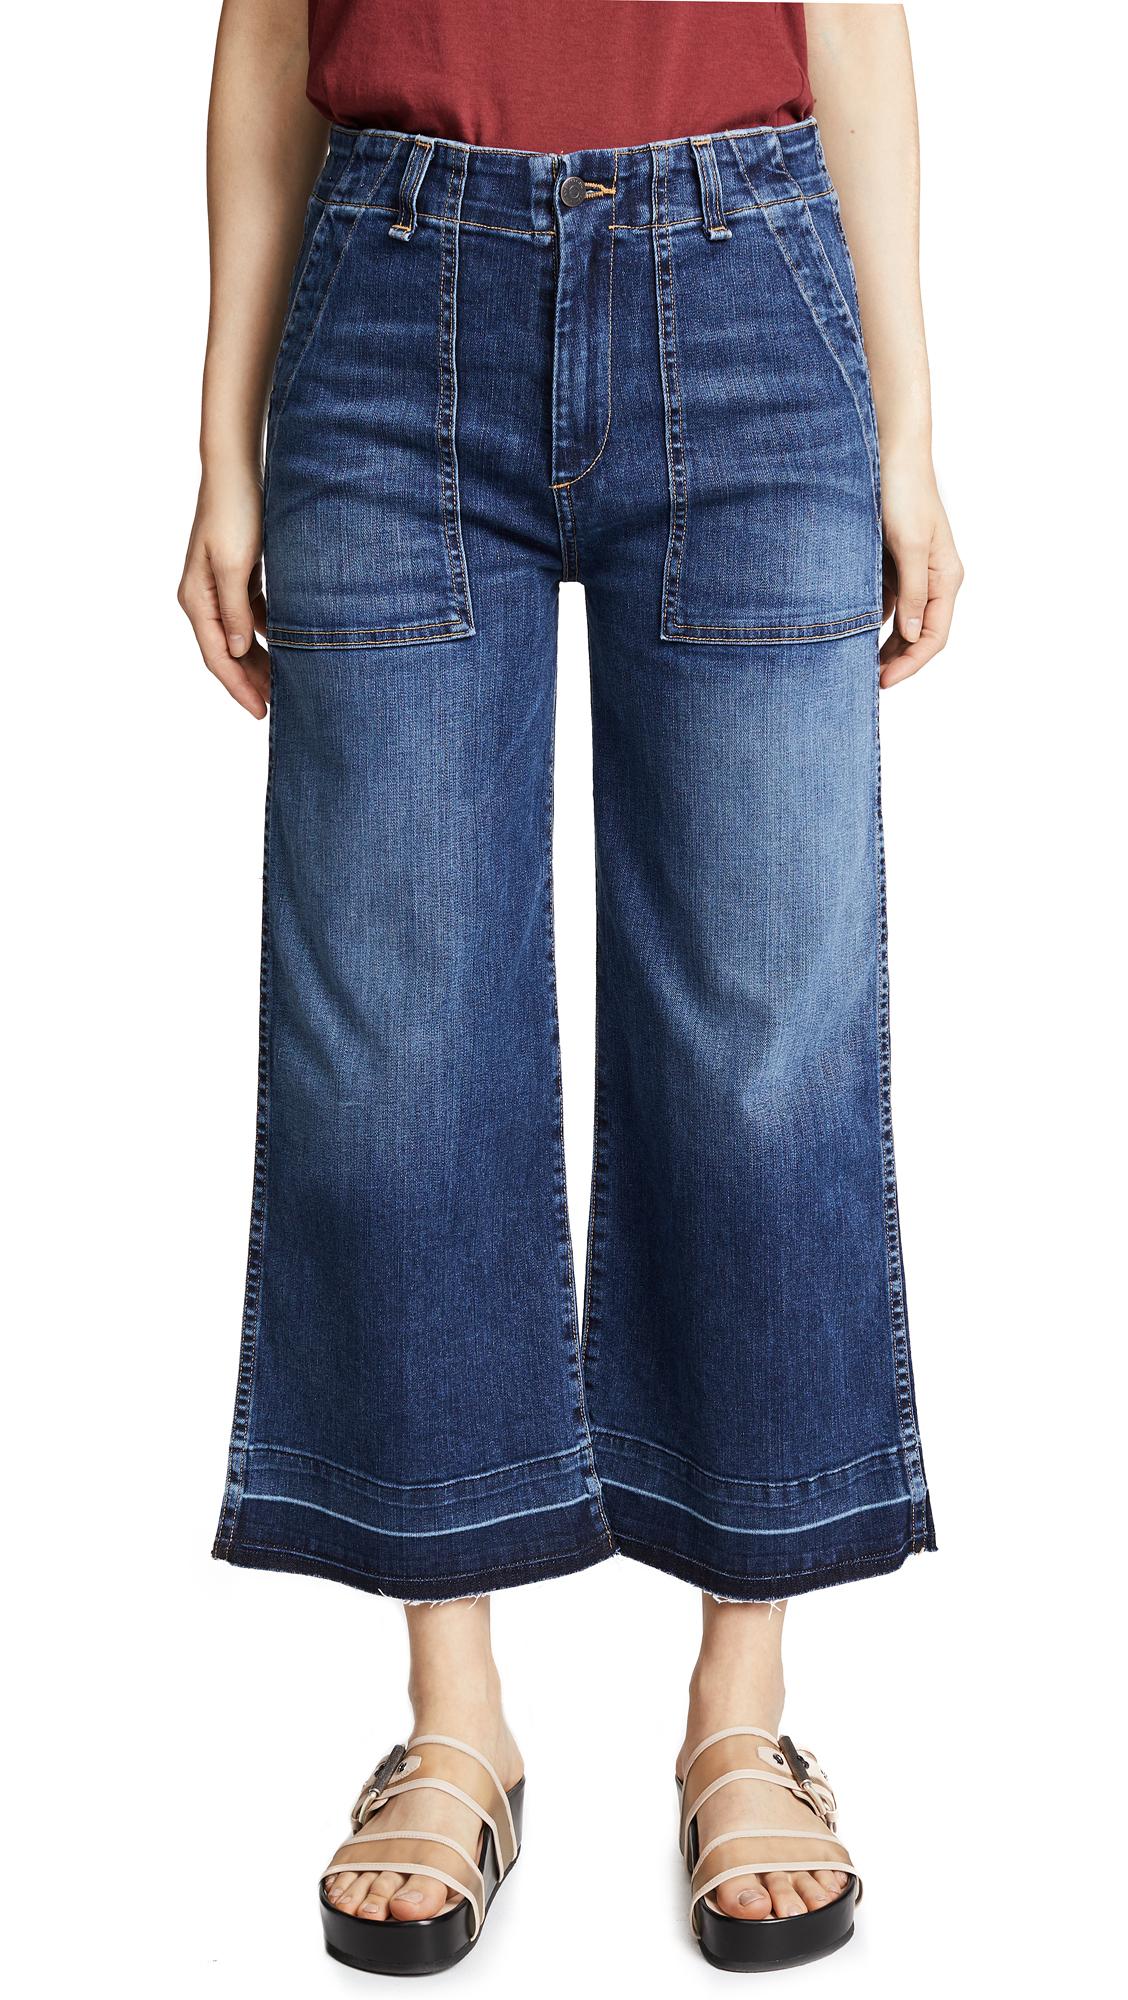 Veronica Beard Jean Lou Gaucho Jeans In River